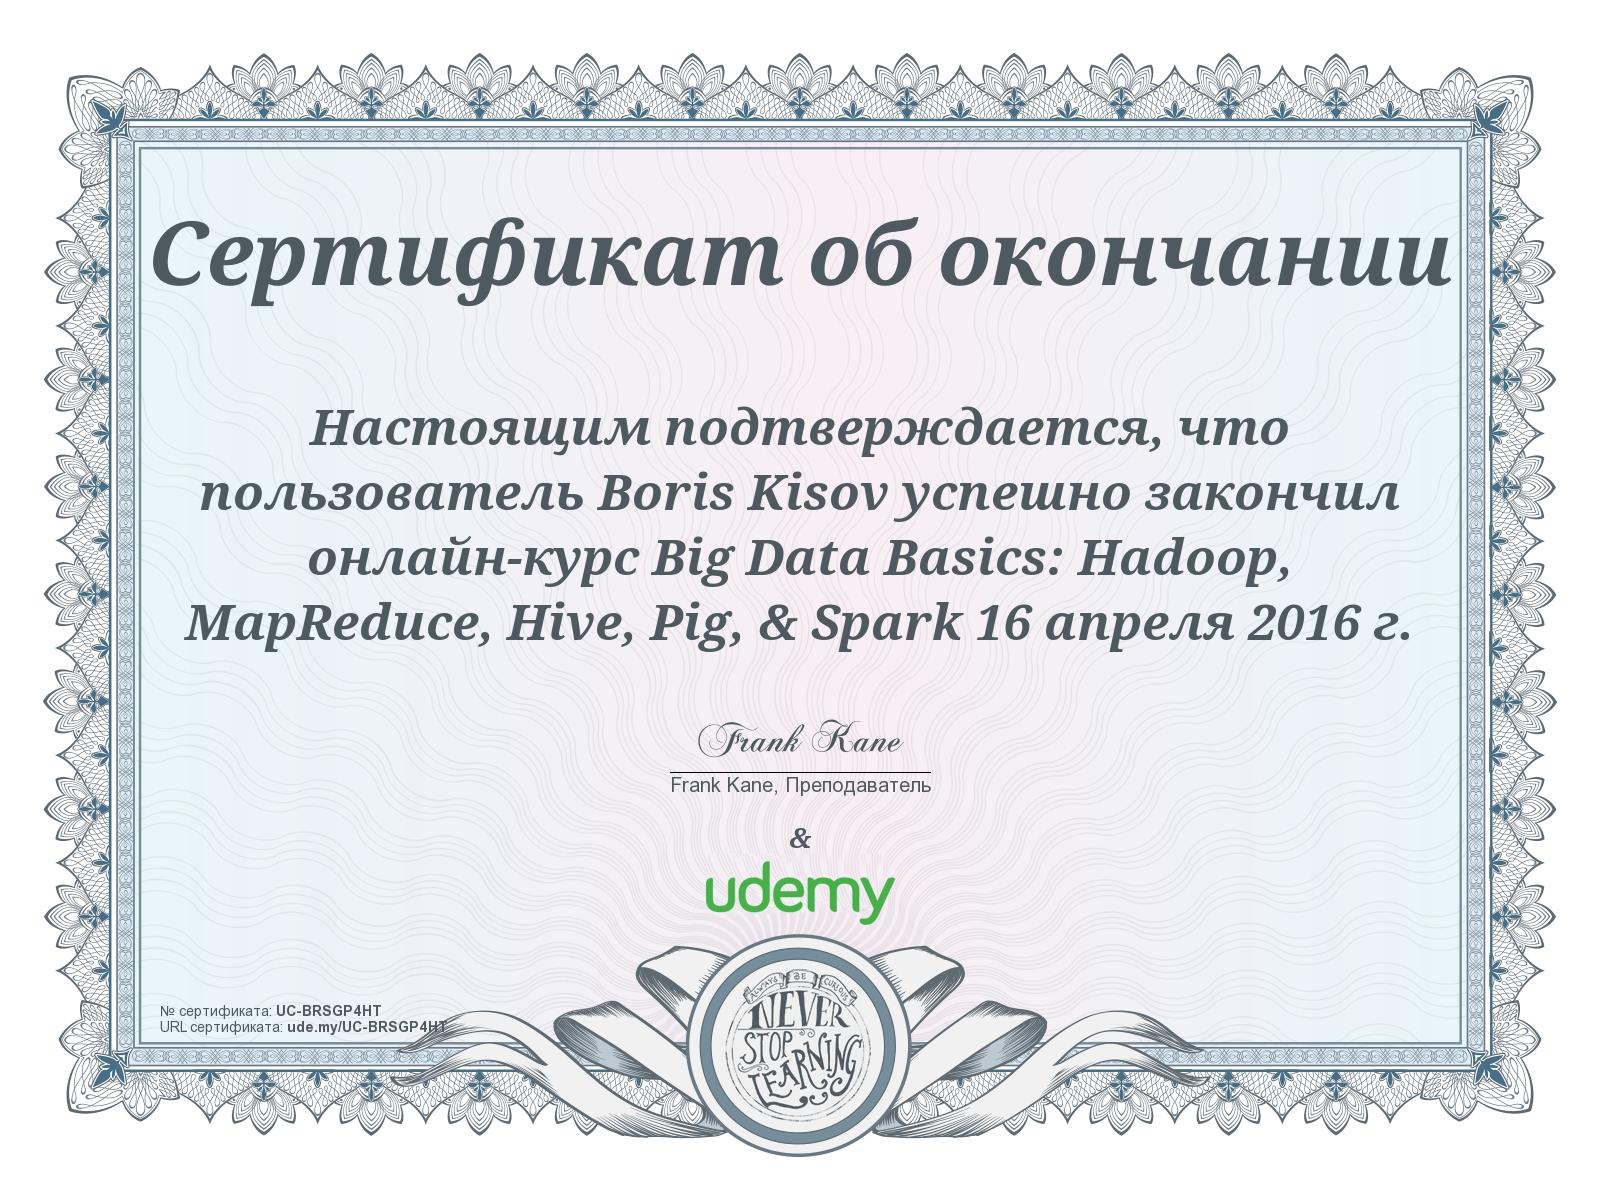 Big Data Basics: Hadoop, MapReduce, Hive, Pig, & Spark